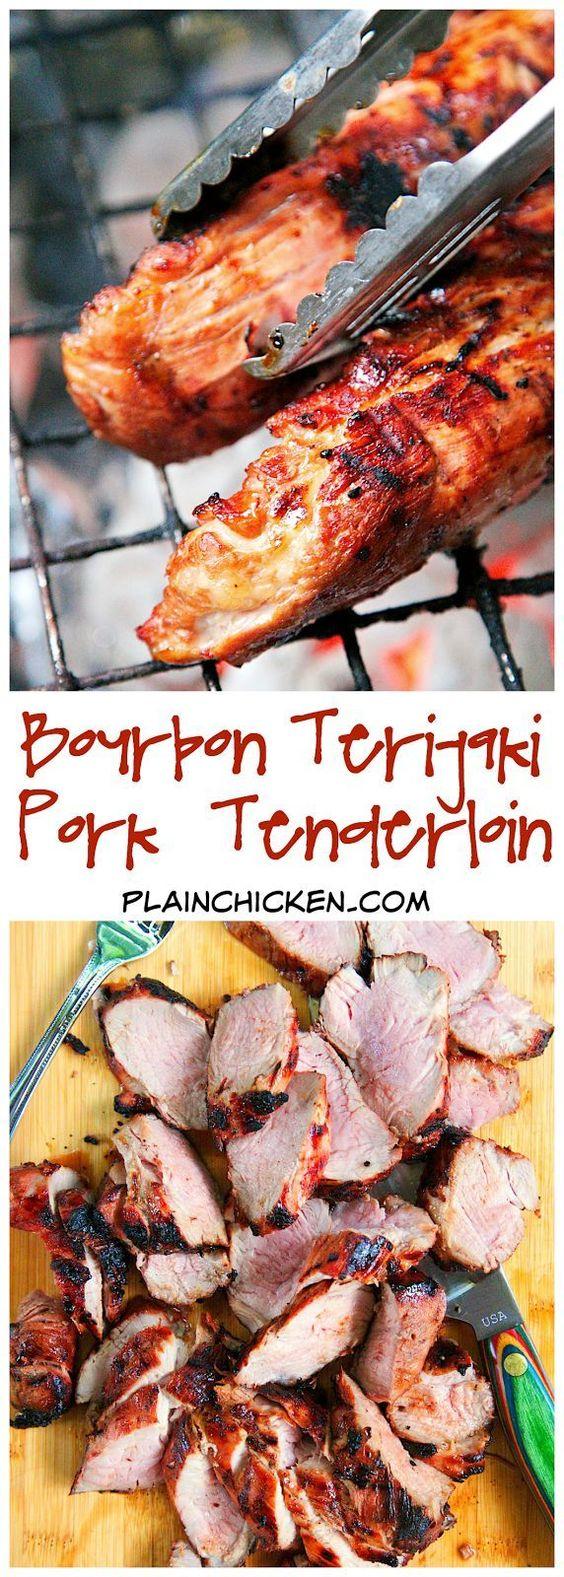 Bourbon Teriyaki Pork Tenderloin Recipe - only 5 ingredients! Teriyaki marinade, bourbon, brown sugar, garlic and pork. SO simple and SO delicious! Can grill or bake pork.